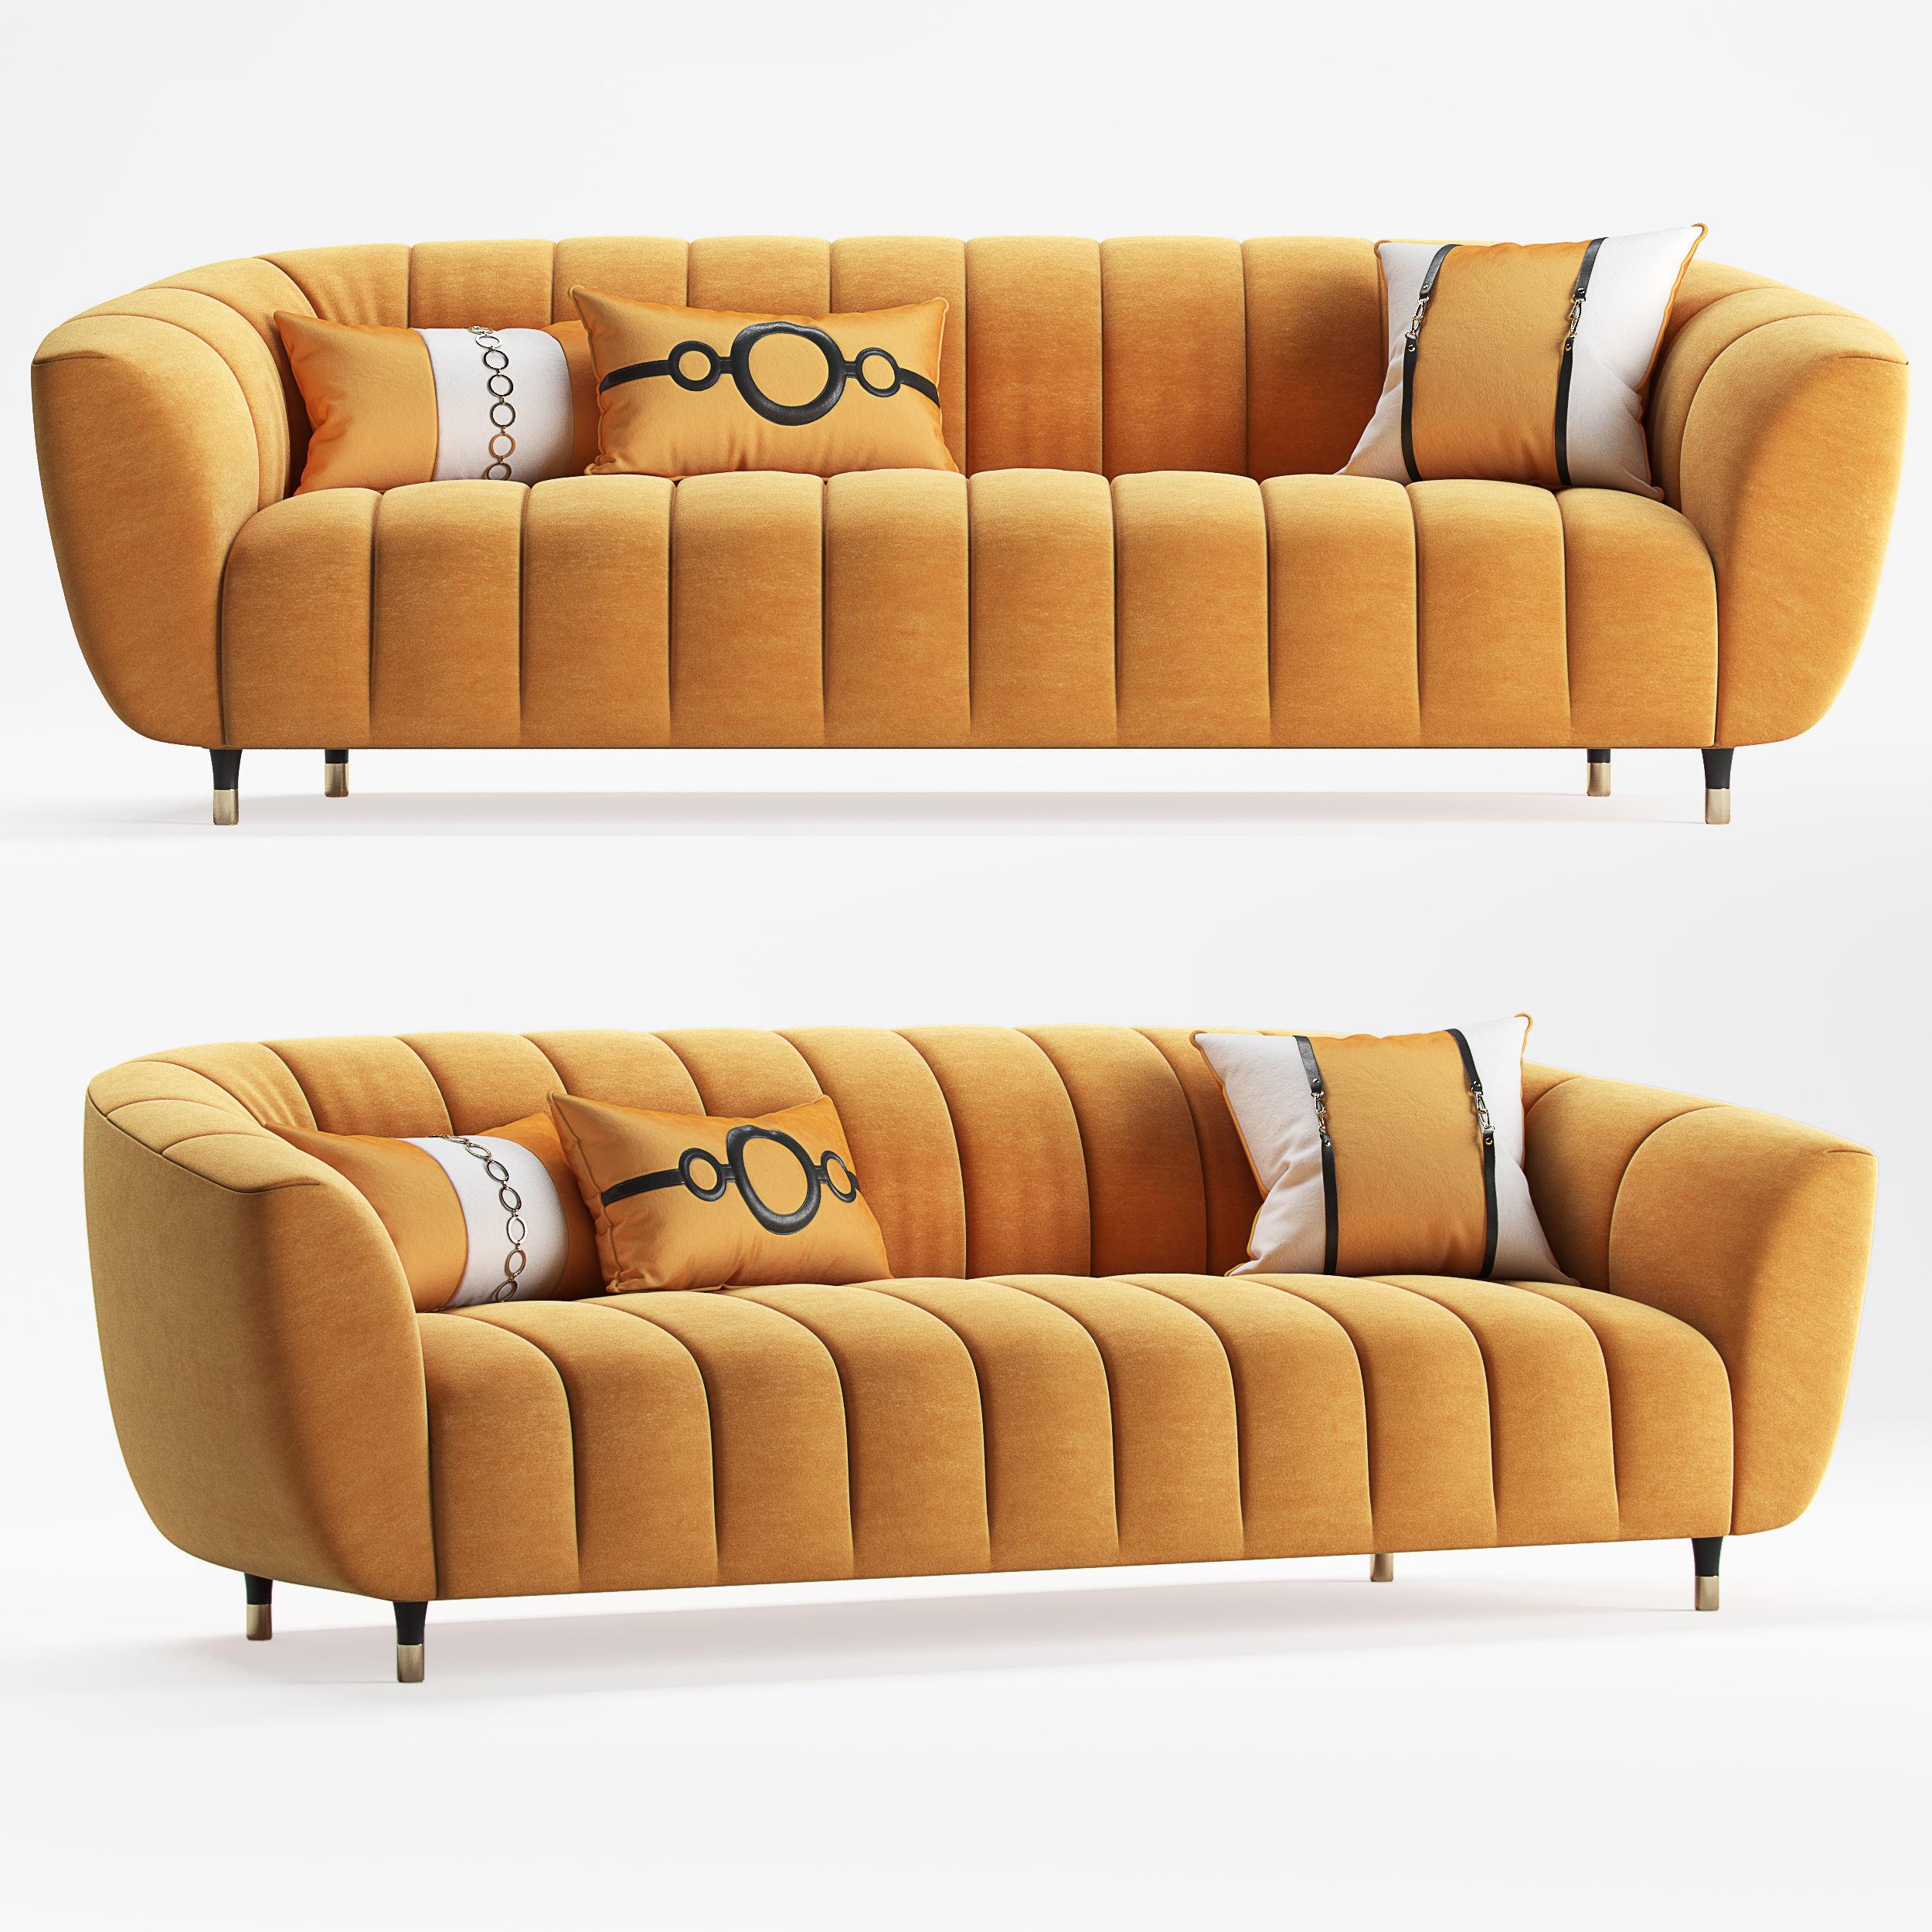 Sofa Spectra 3 Seater 3D model MAX OBJ FBX